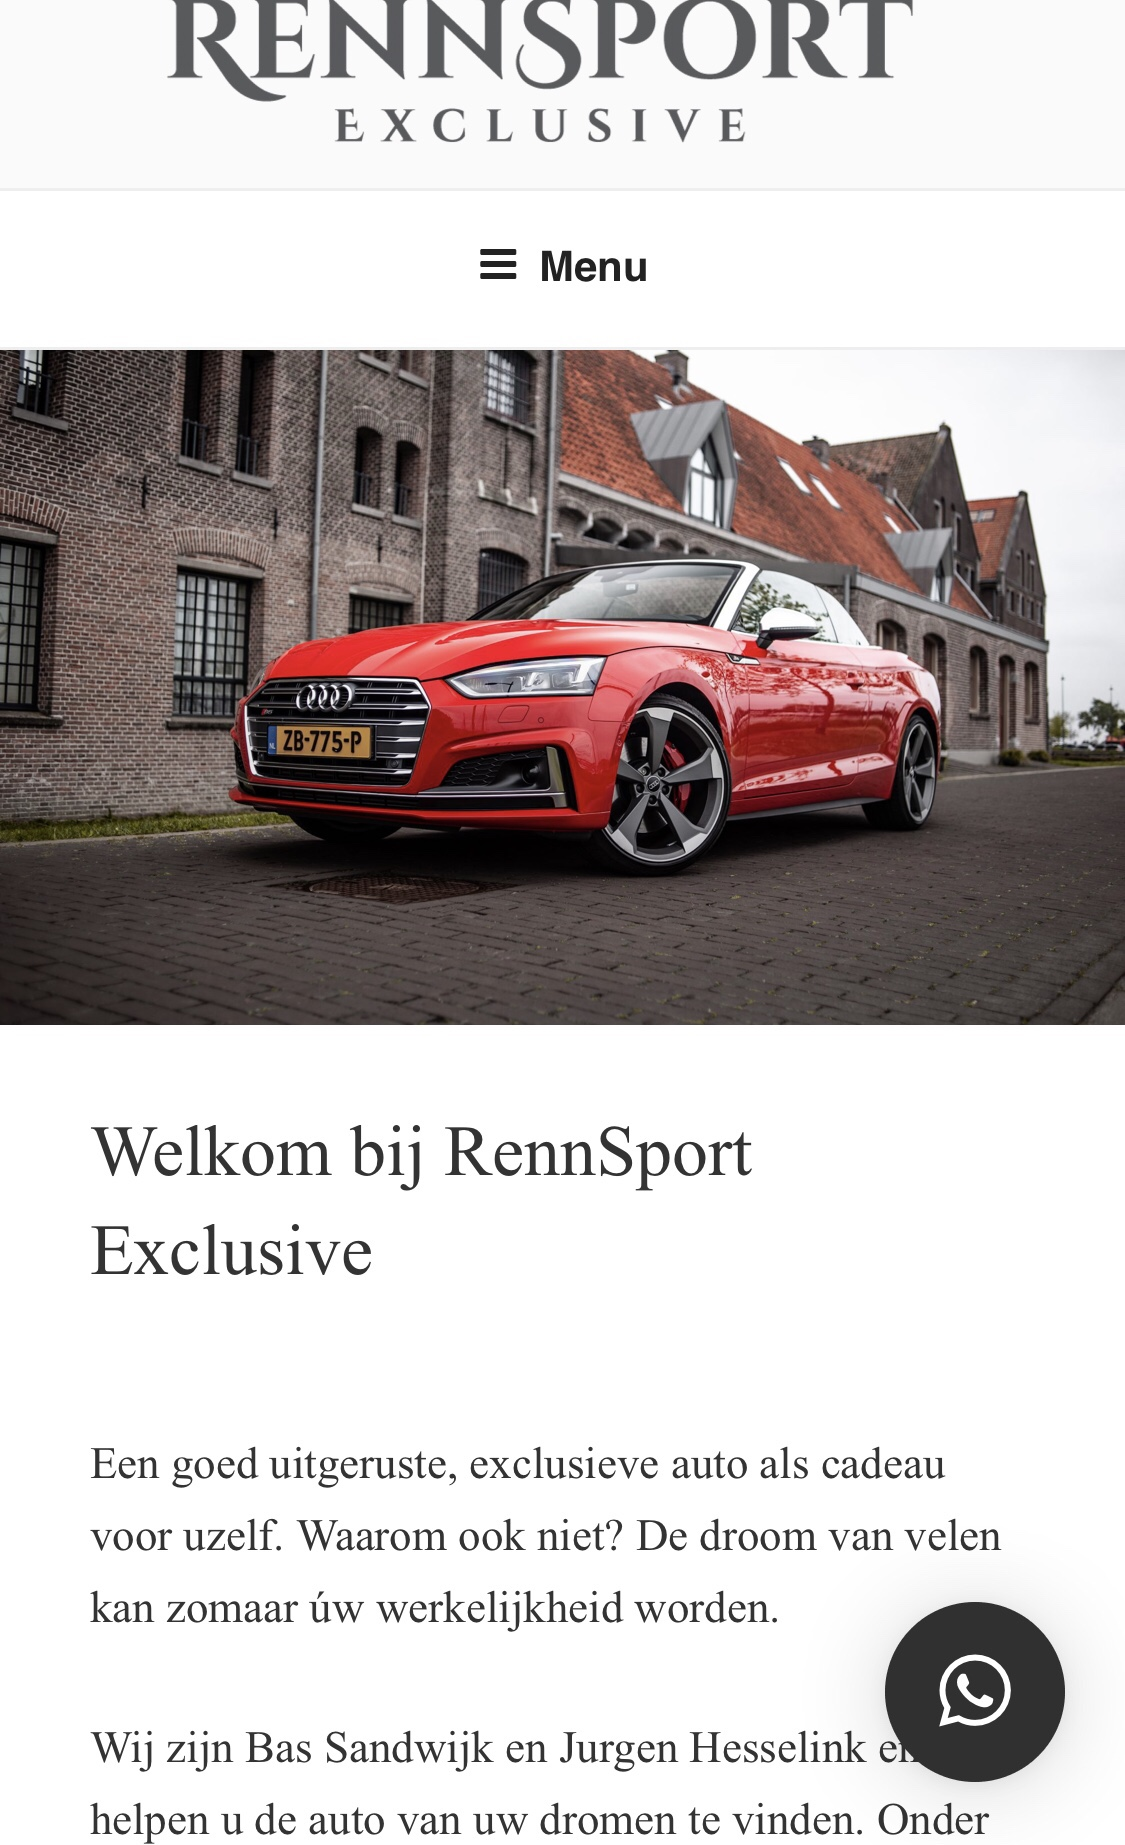 RennSport Exclusive